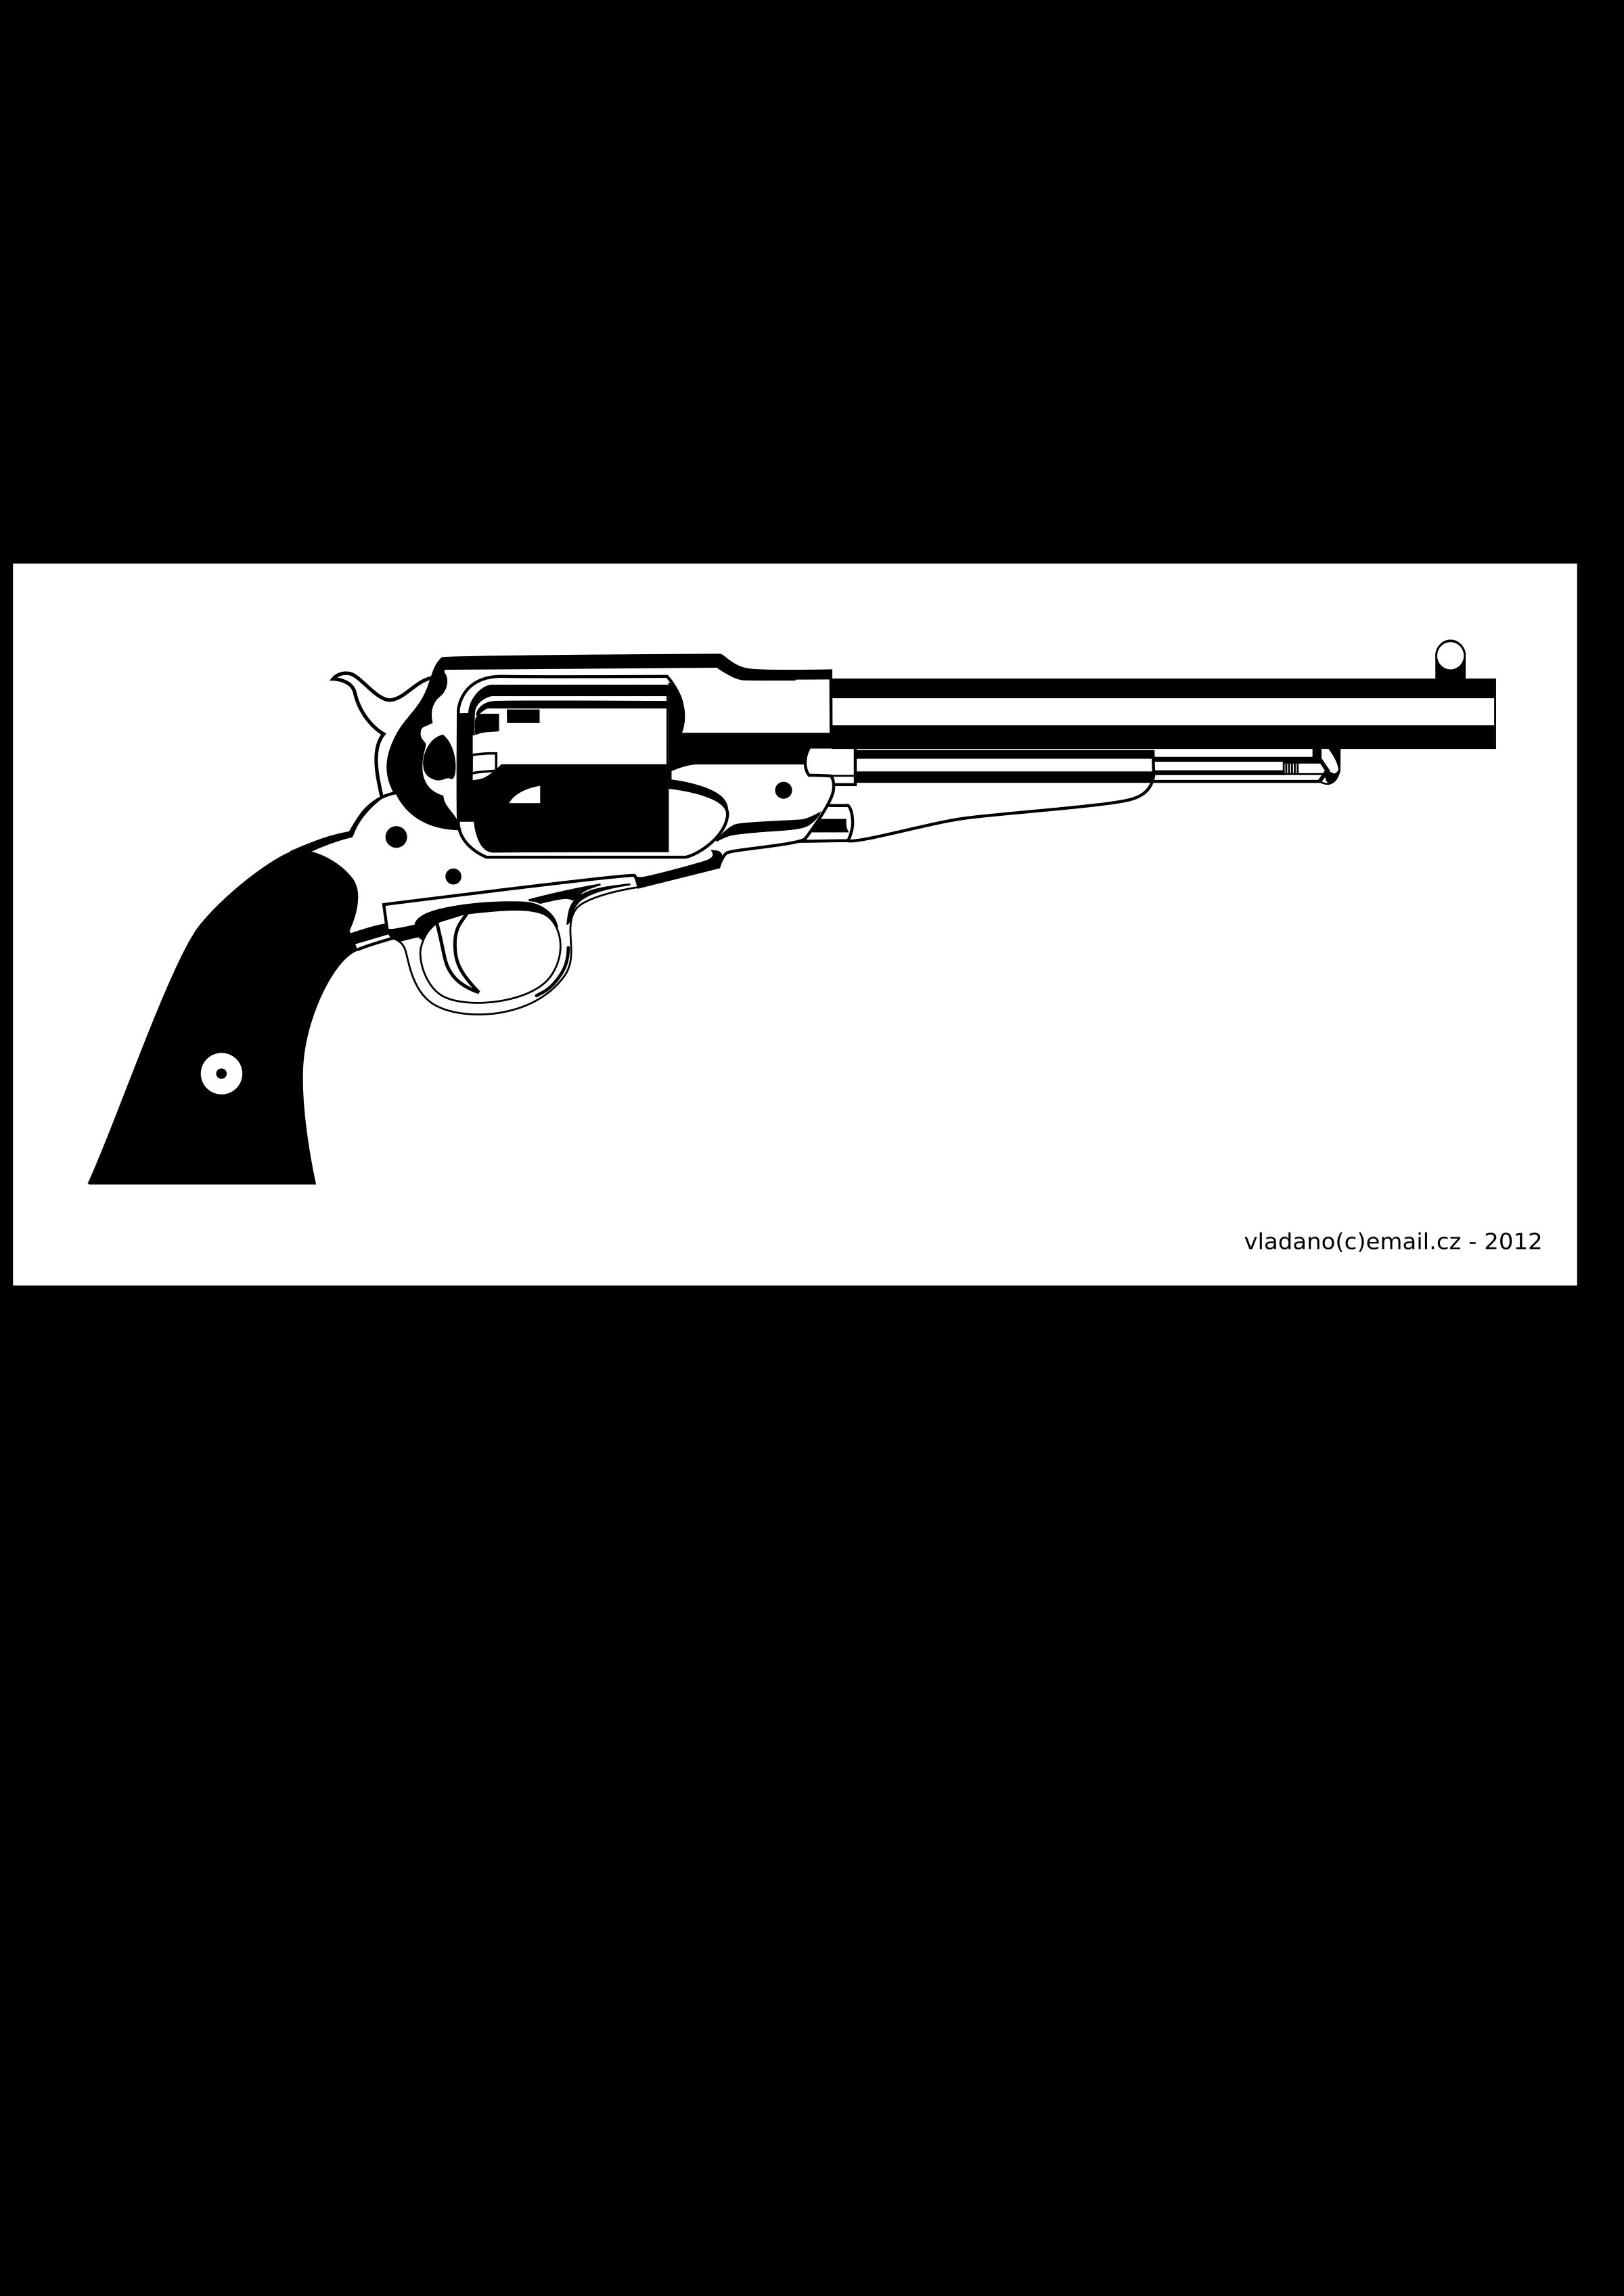 Clipart gun pdf. Revolver remington new model